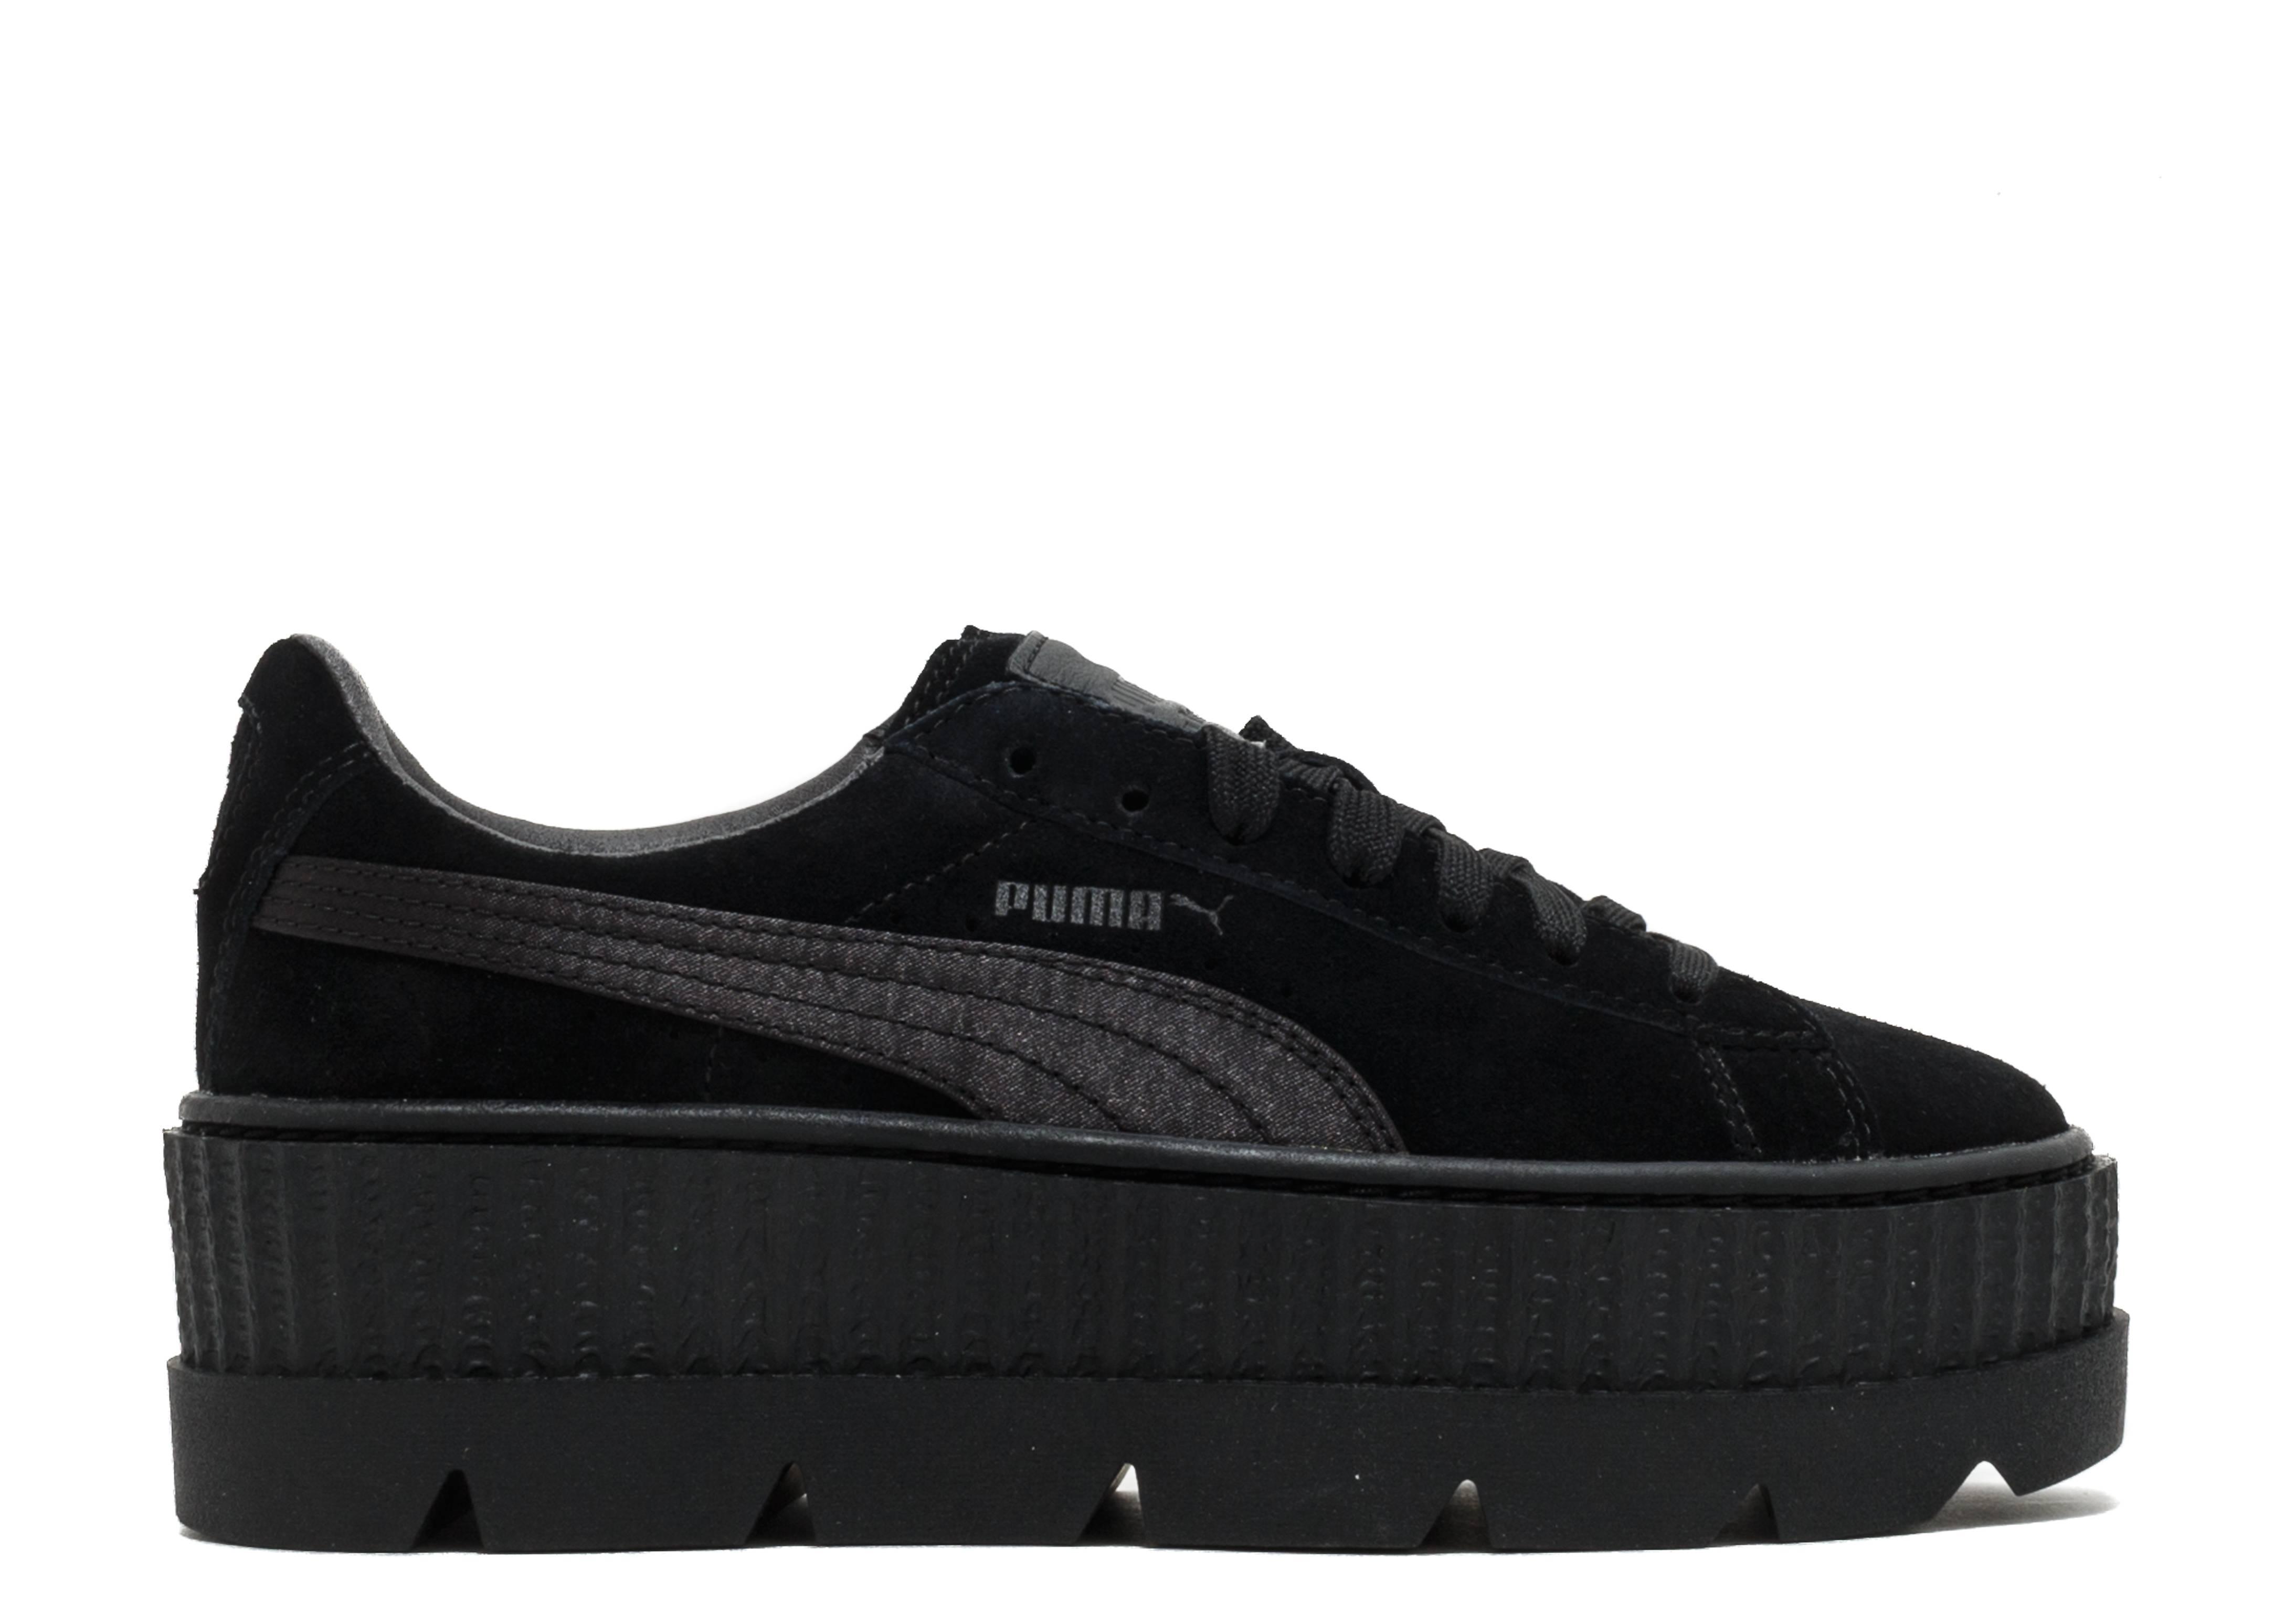 FOOTWEAR - Low-tops & sneakers Fenty Puma by Rihanna hS4e9QwAq